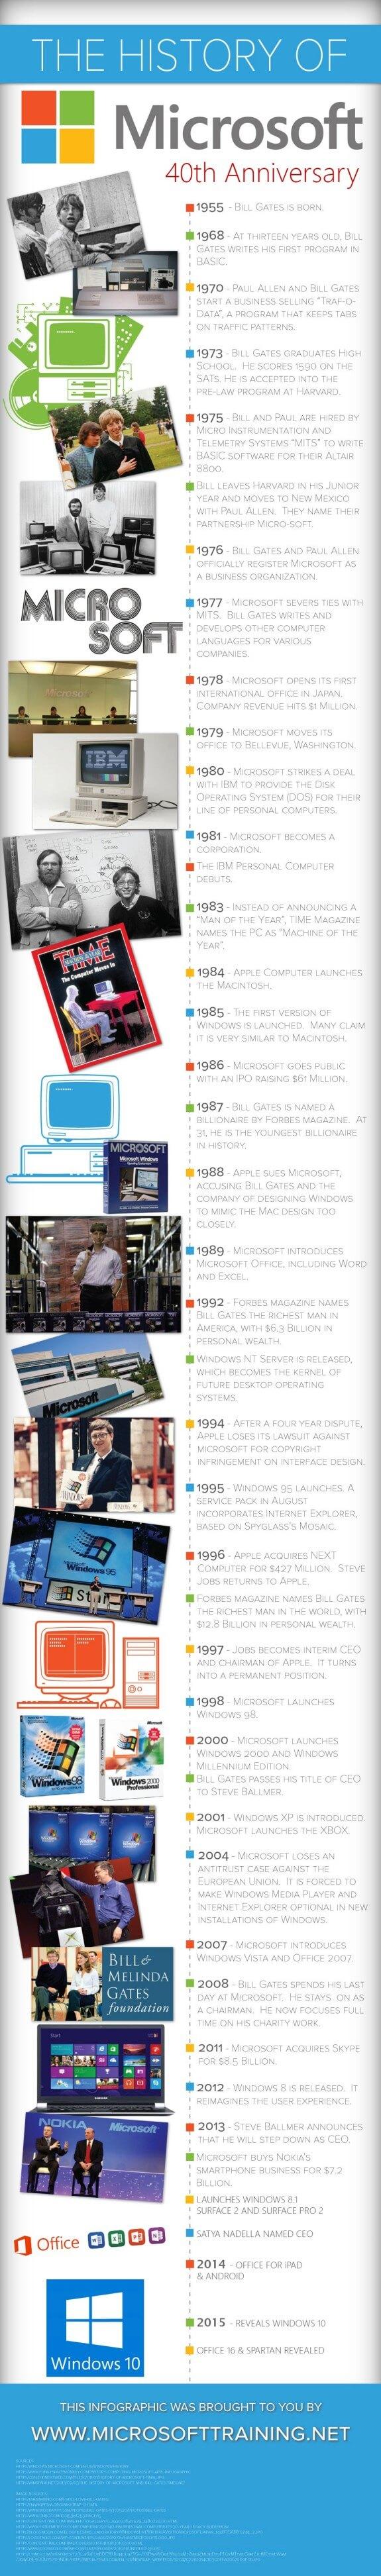 The History of Microsoft at 40